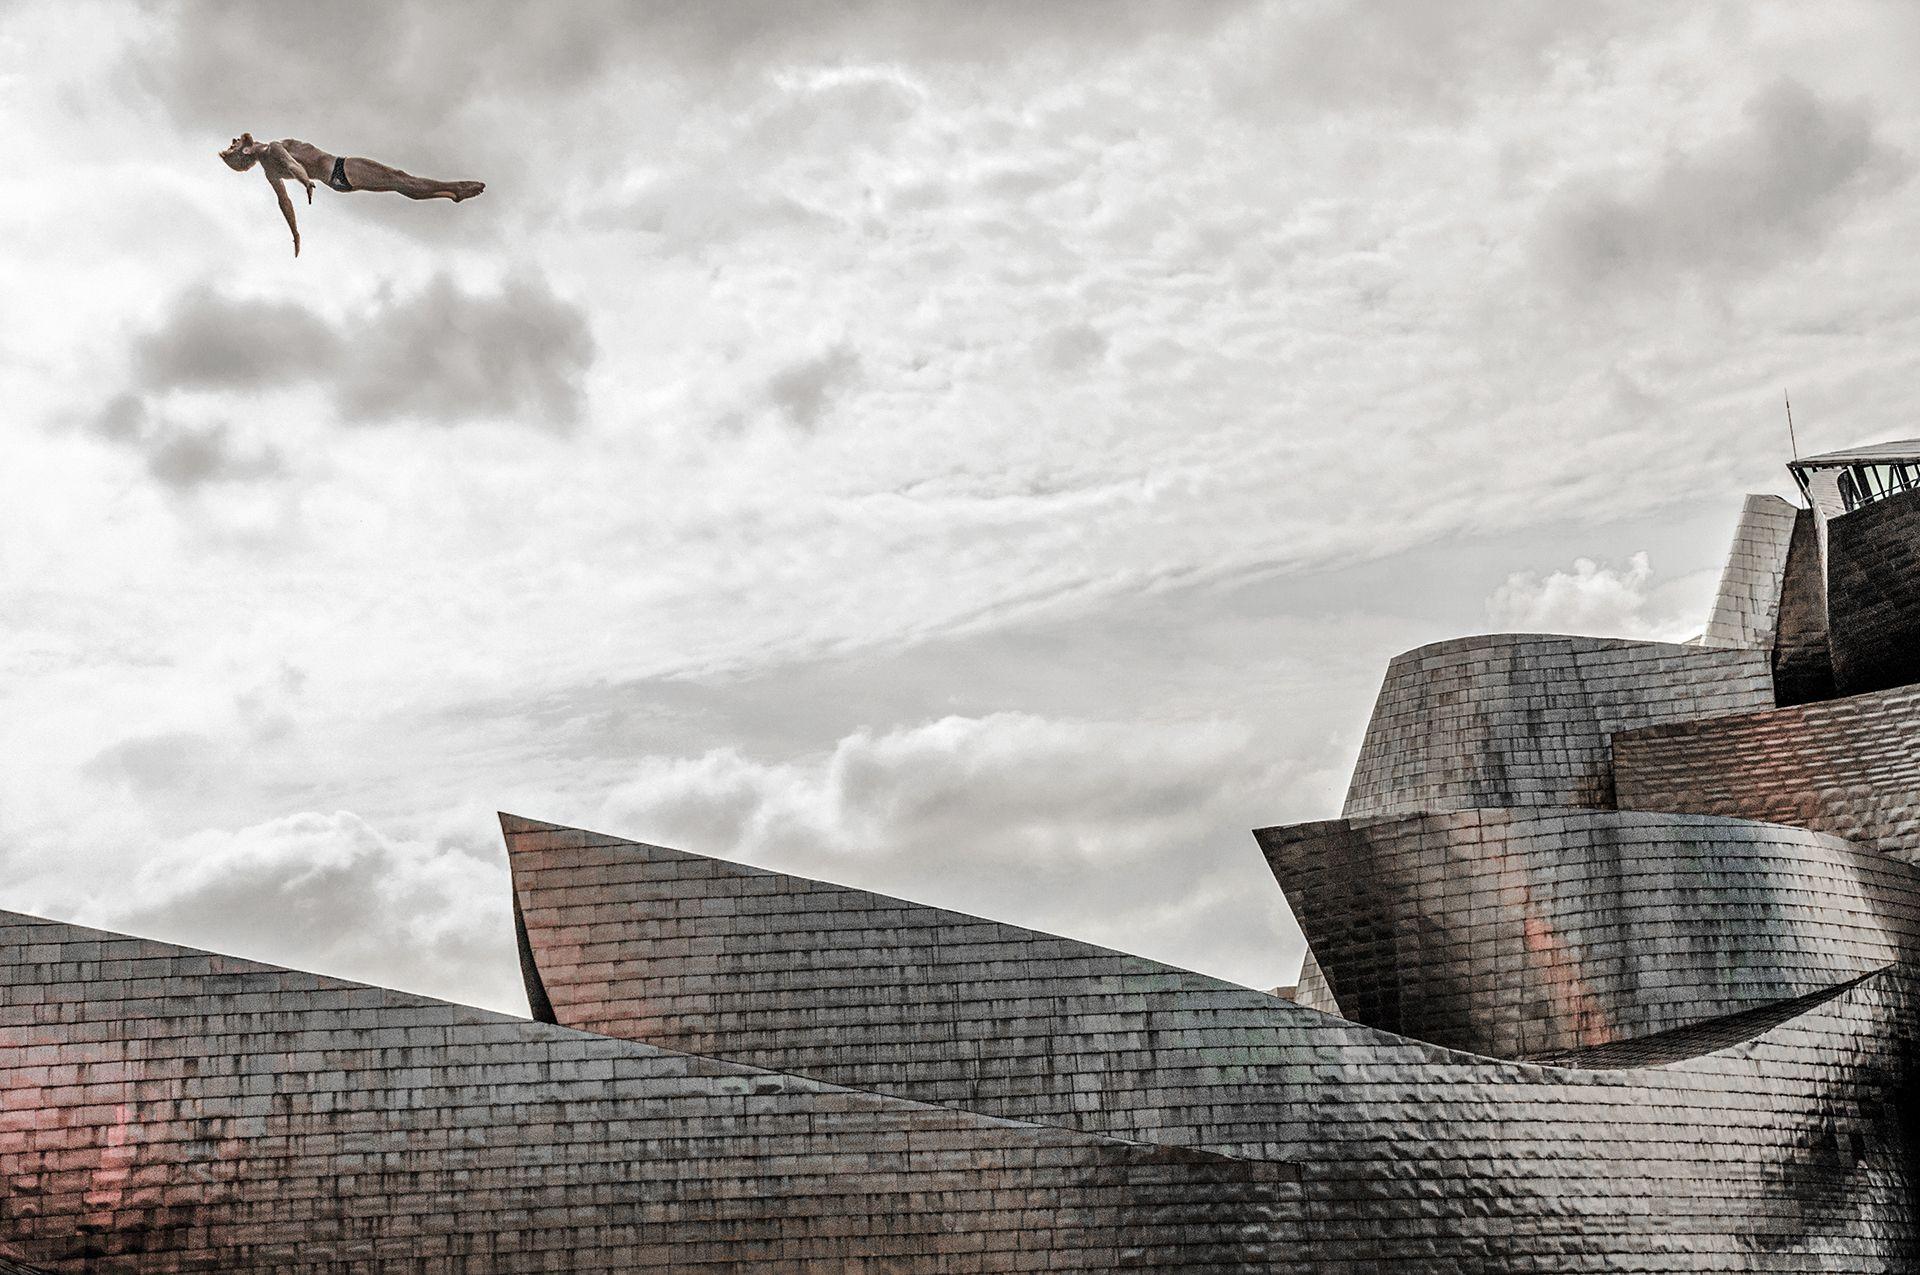 Levitating at the Guggenheim